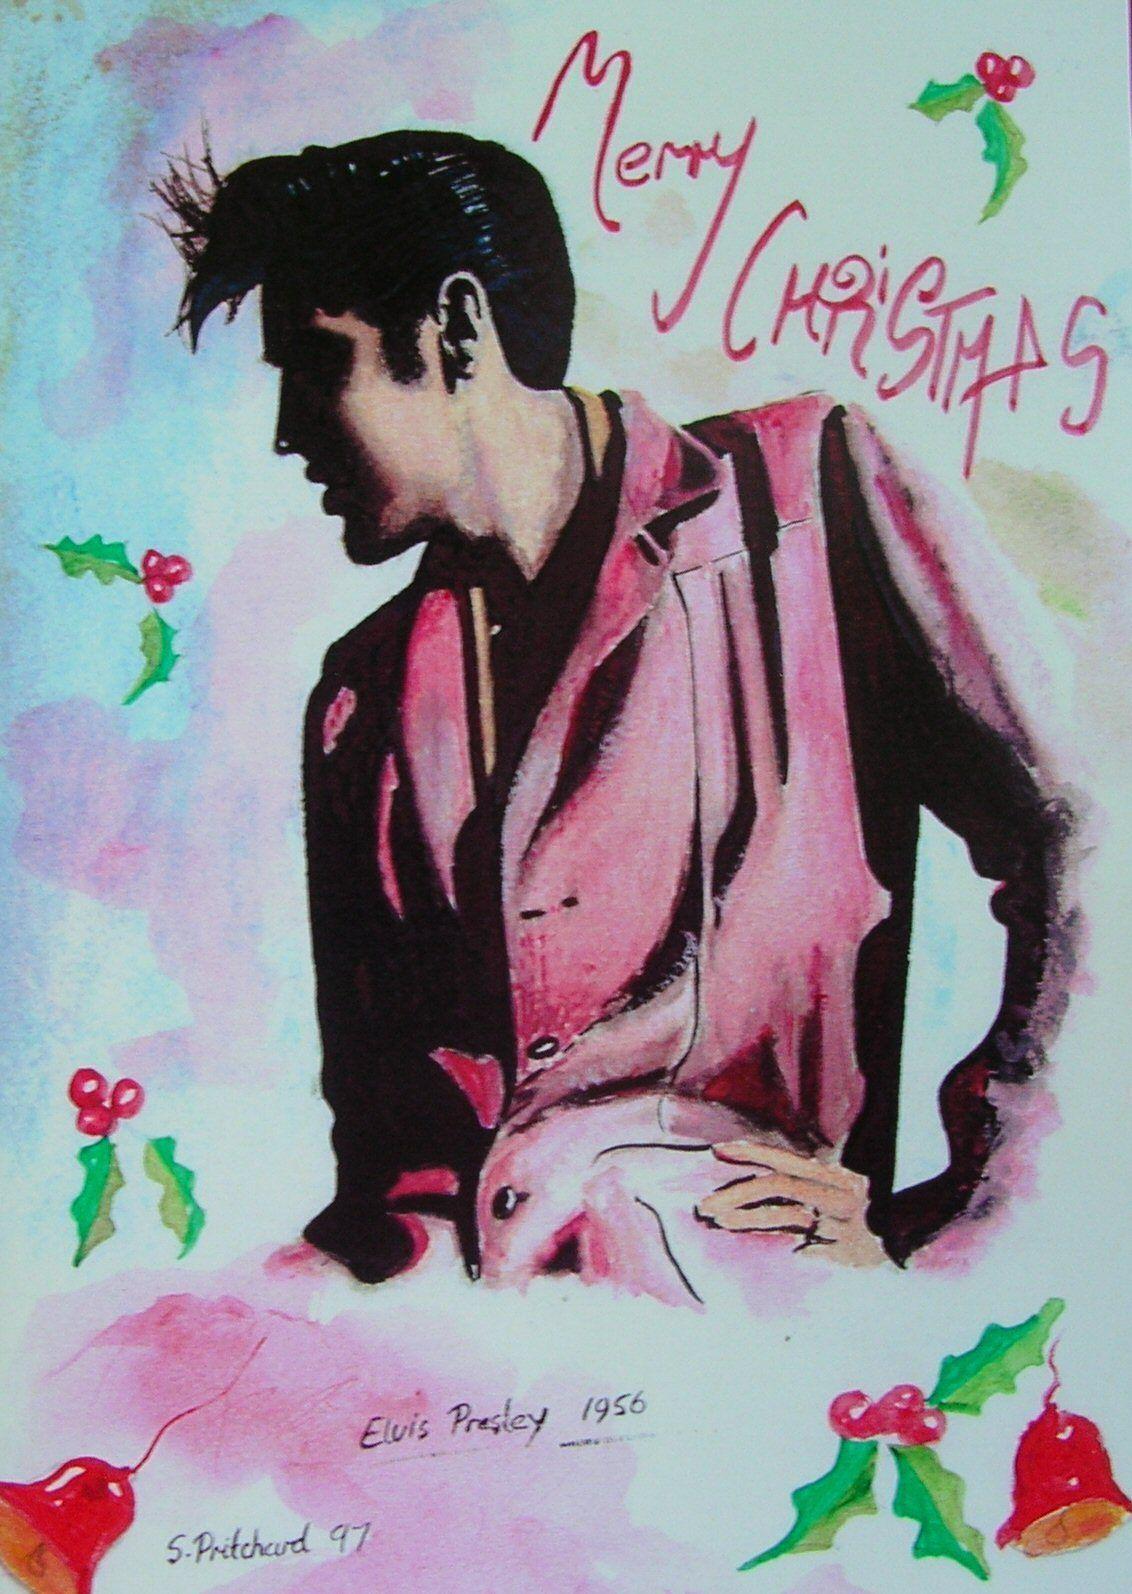 Elvis presley christmas card 1950s rock \'n\' roll rockabilly memphis ...